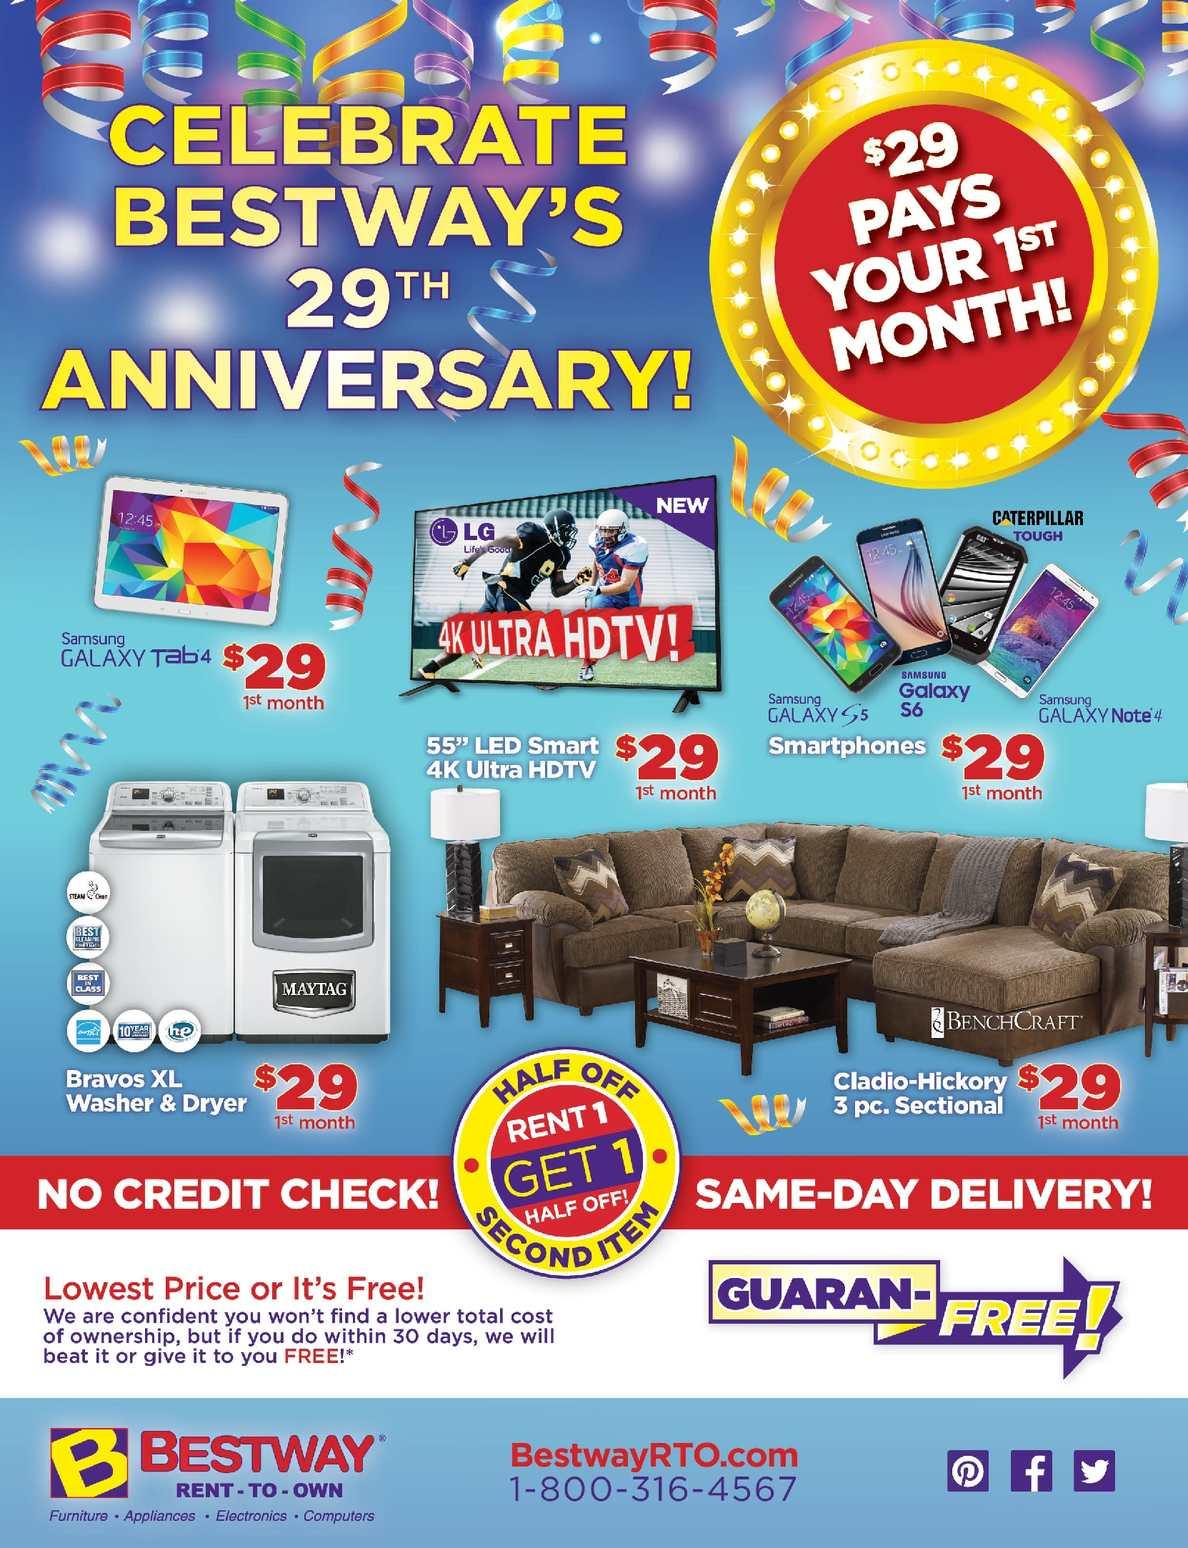 Calaméo - Enjoy rent to own furniture, Appliances, Computer @ 15$